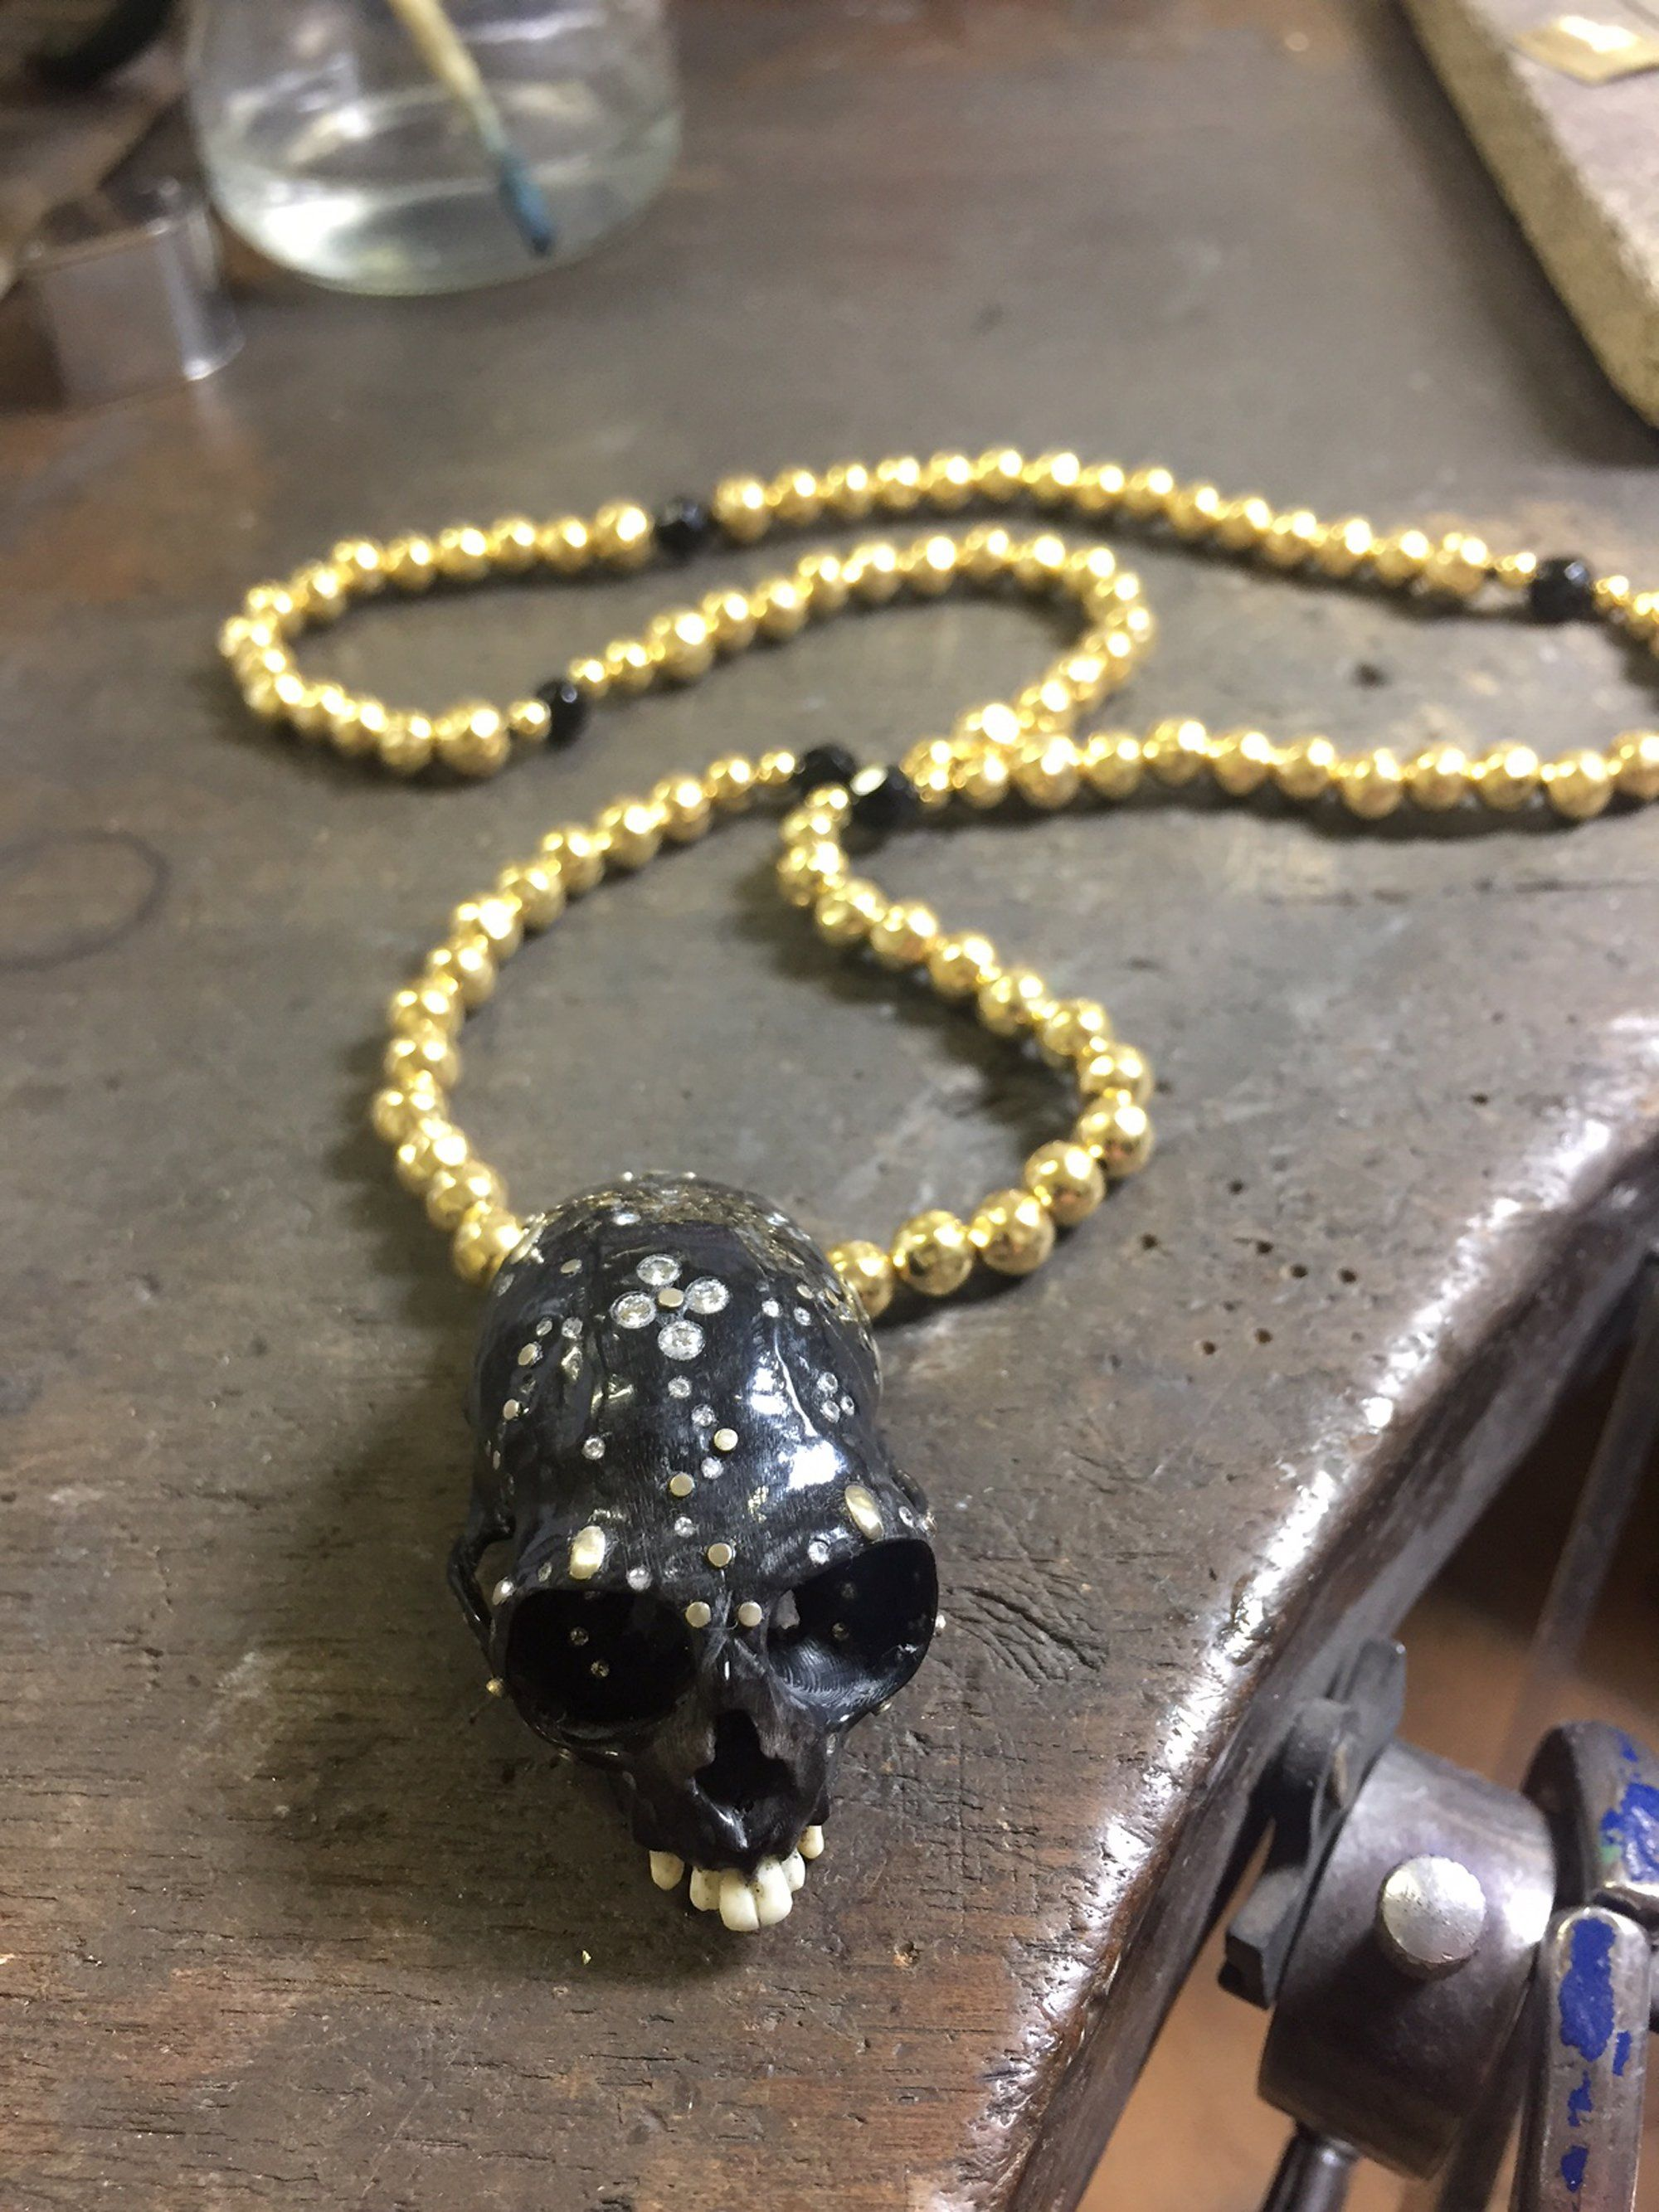 Jewelry Designer Harumi Klossowska de Rola Brings Her Precious